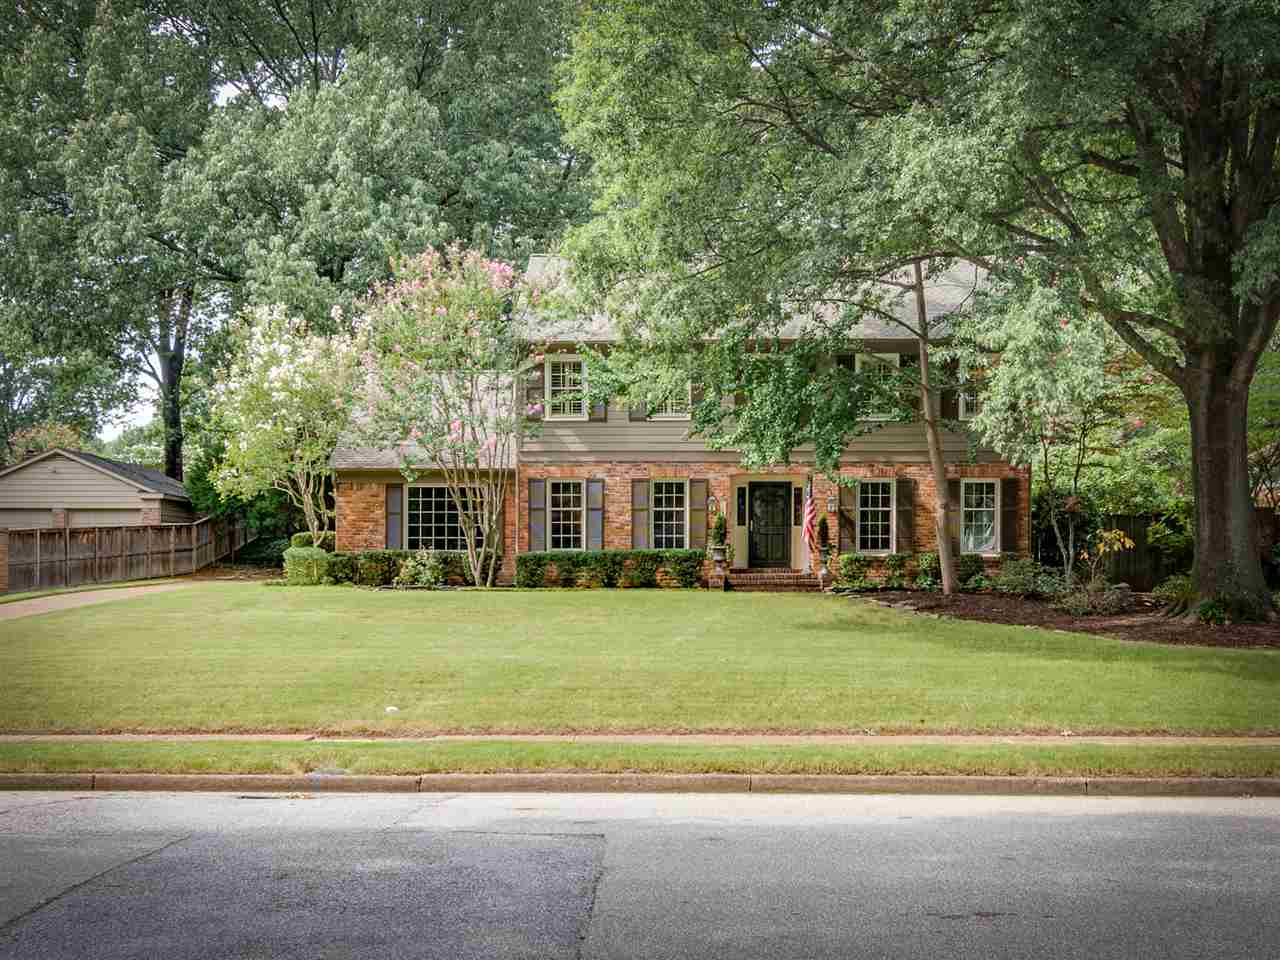 5440 Sycamore Grove, Memphis, TN 38120